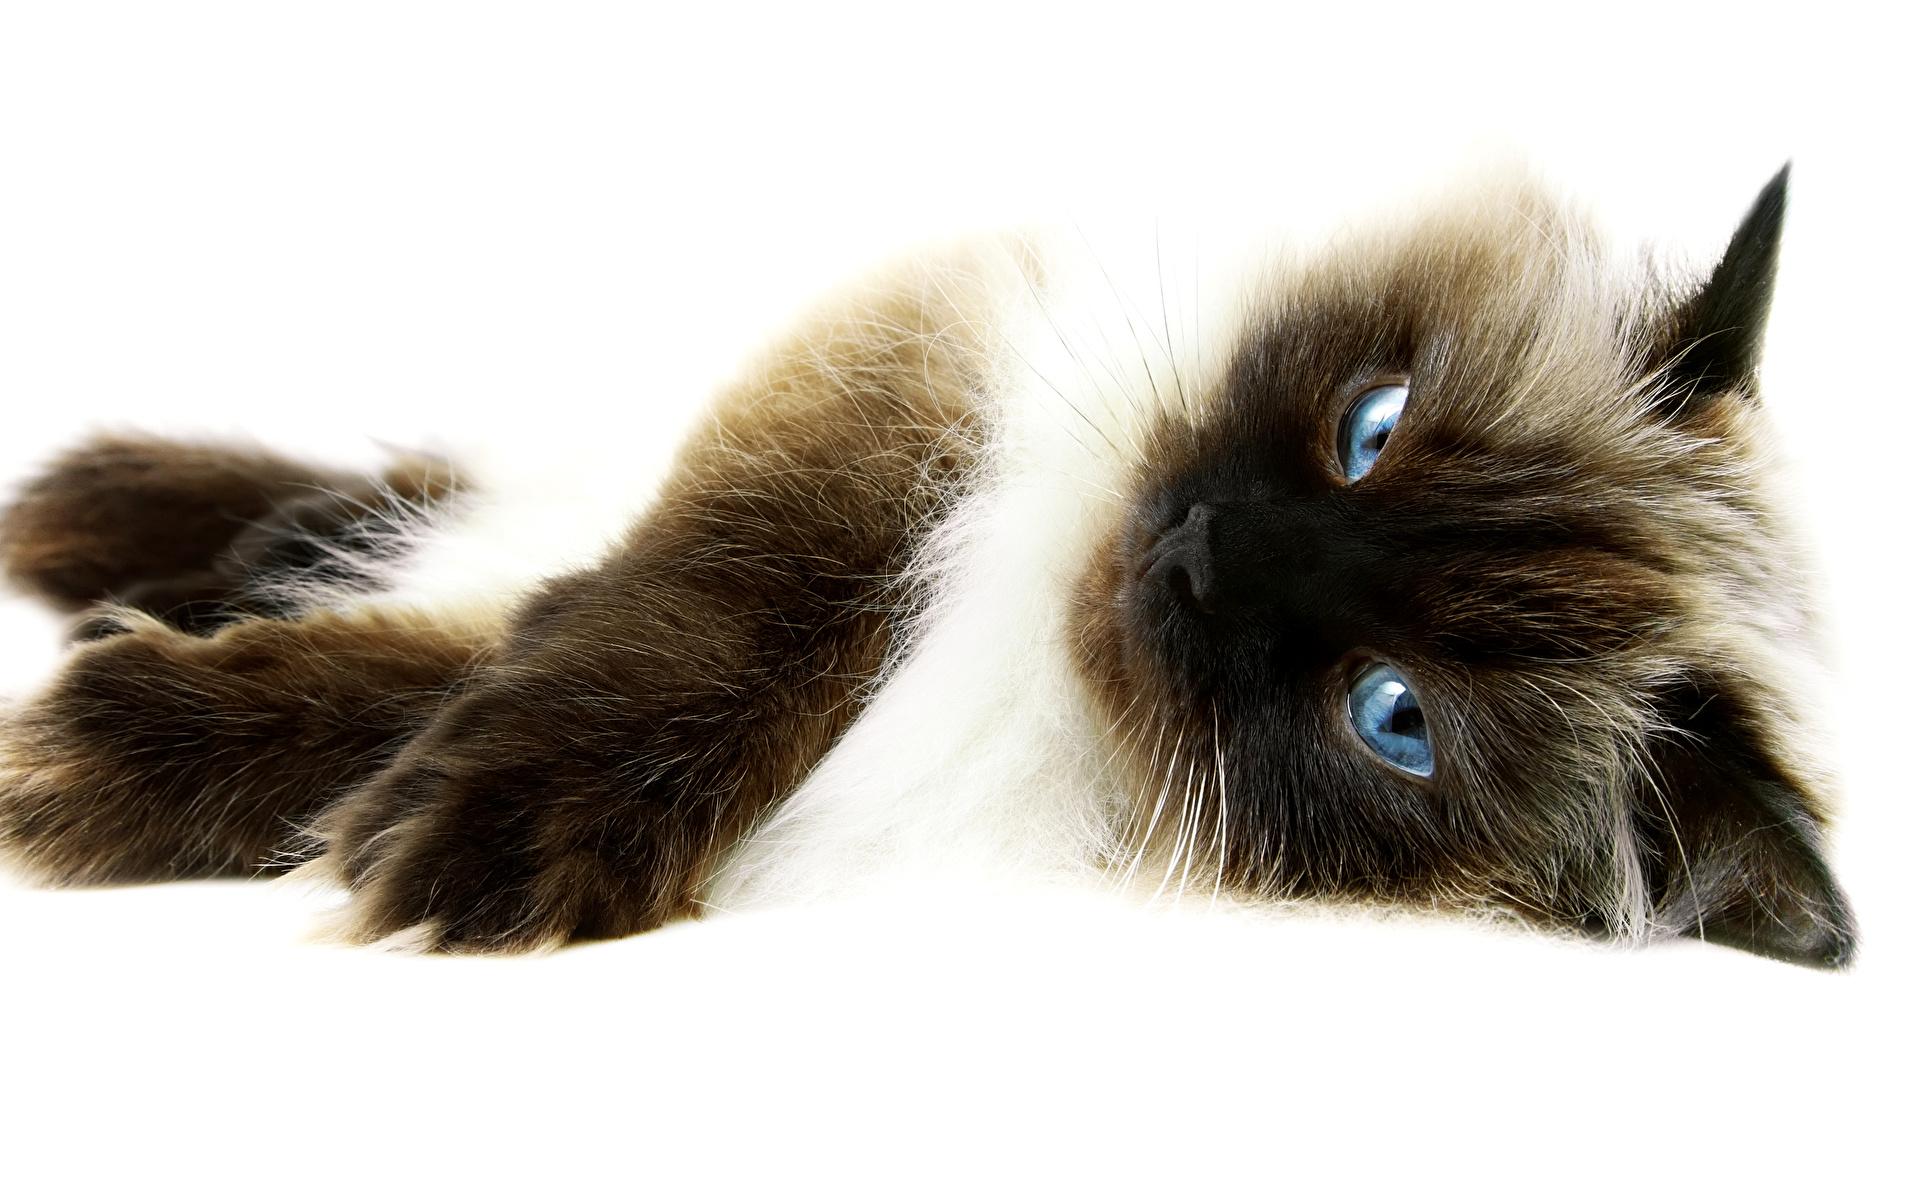 Котенок сеамский  № 2960633 бесплатно